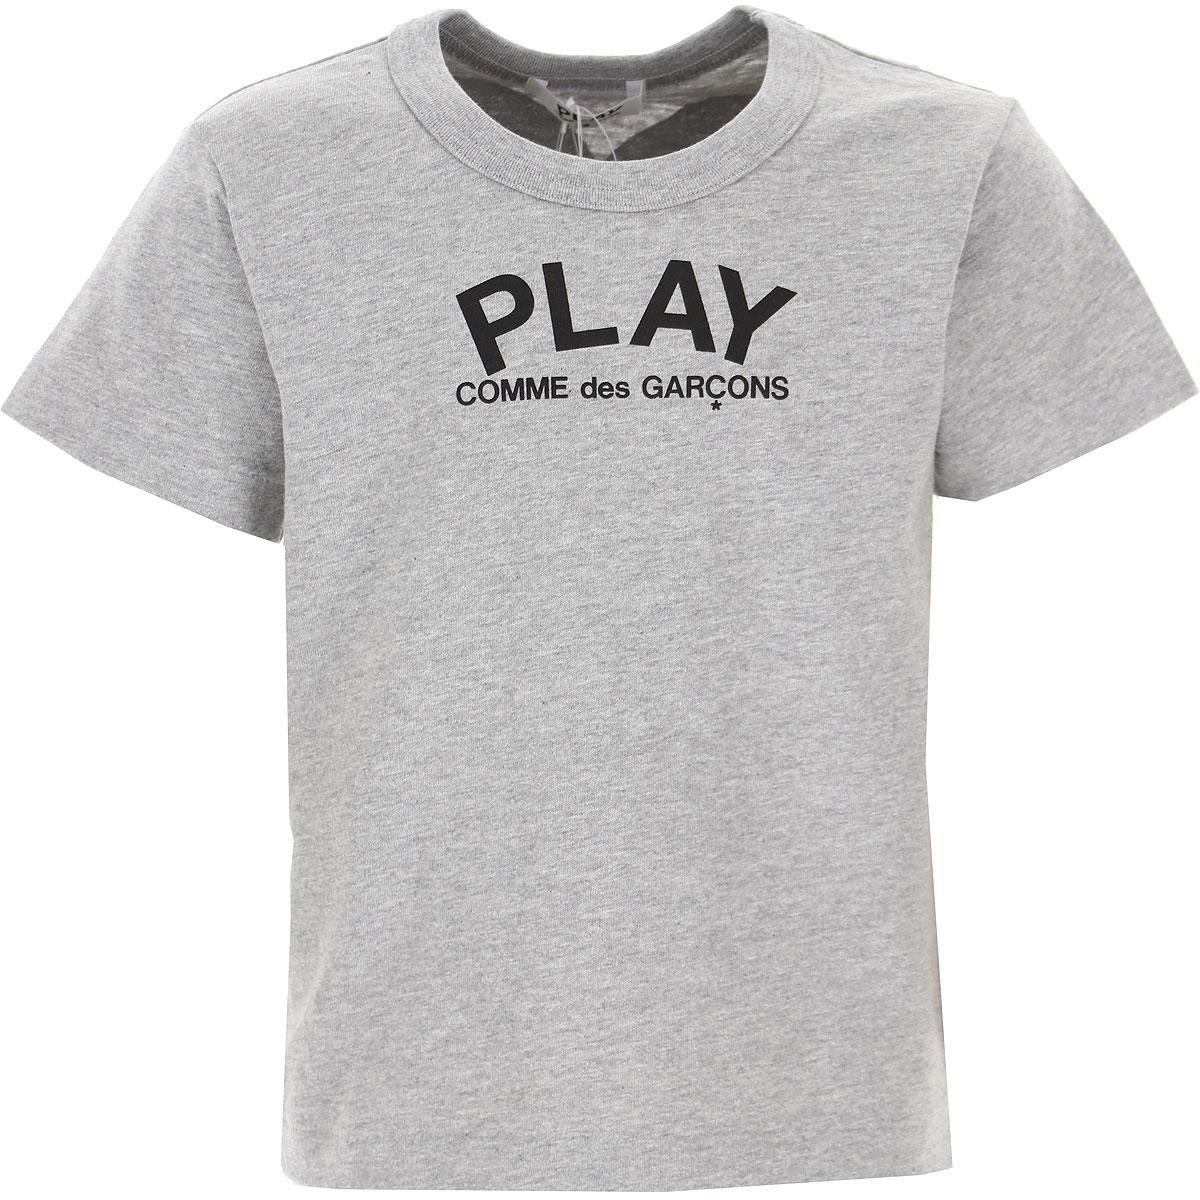 Comme des Garcons Kids T-Shirt for Boys On Sale, Grey, Cotton, 2019, 2Y 4Y 6Y